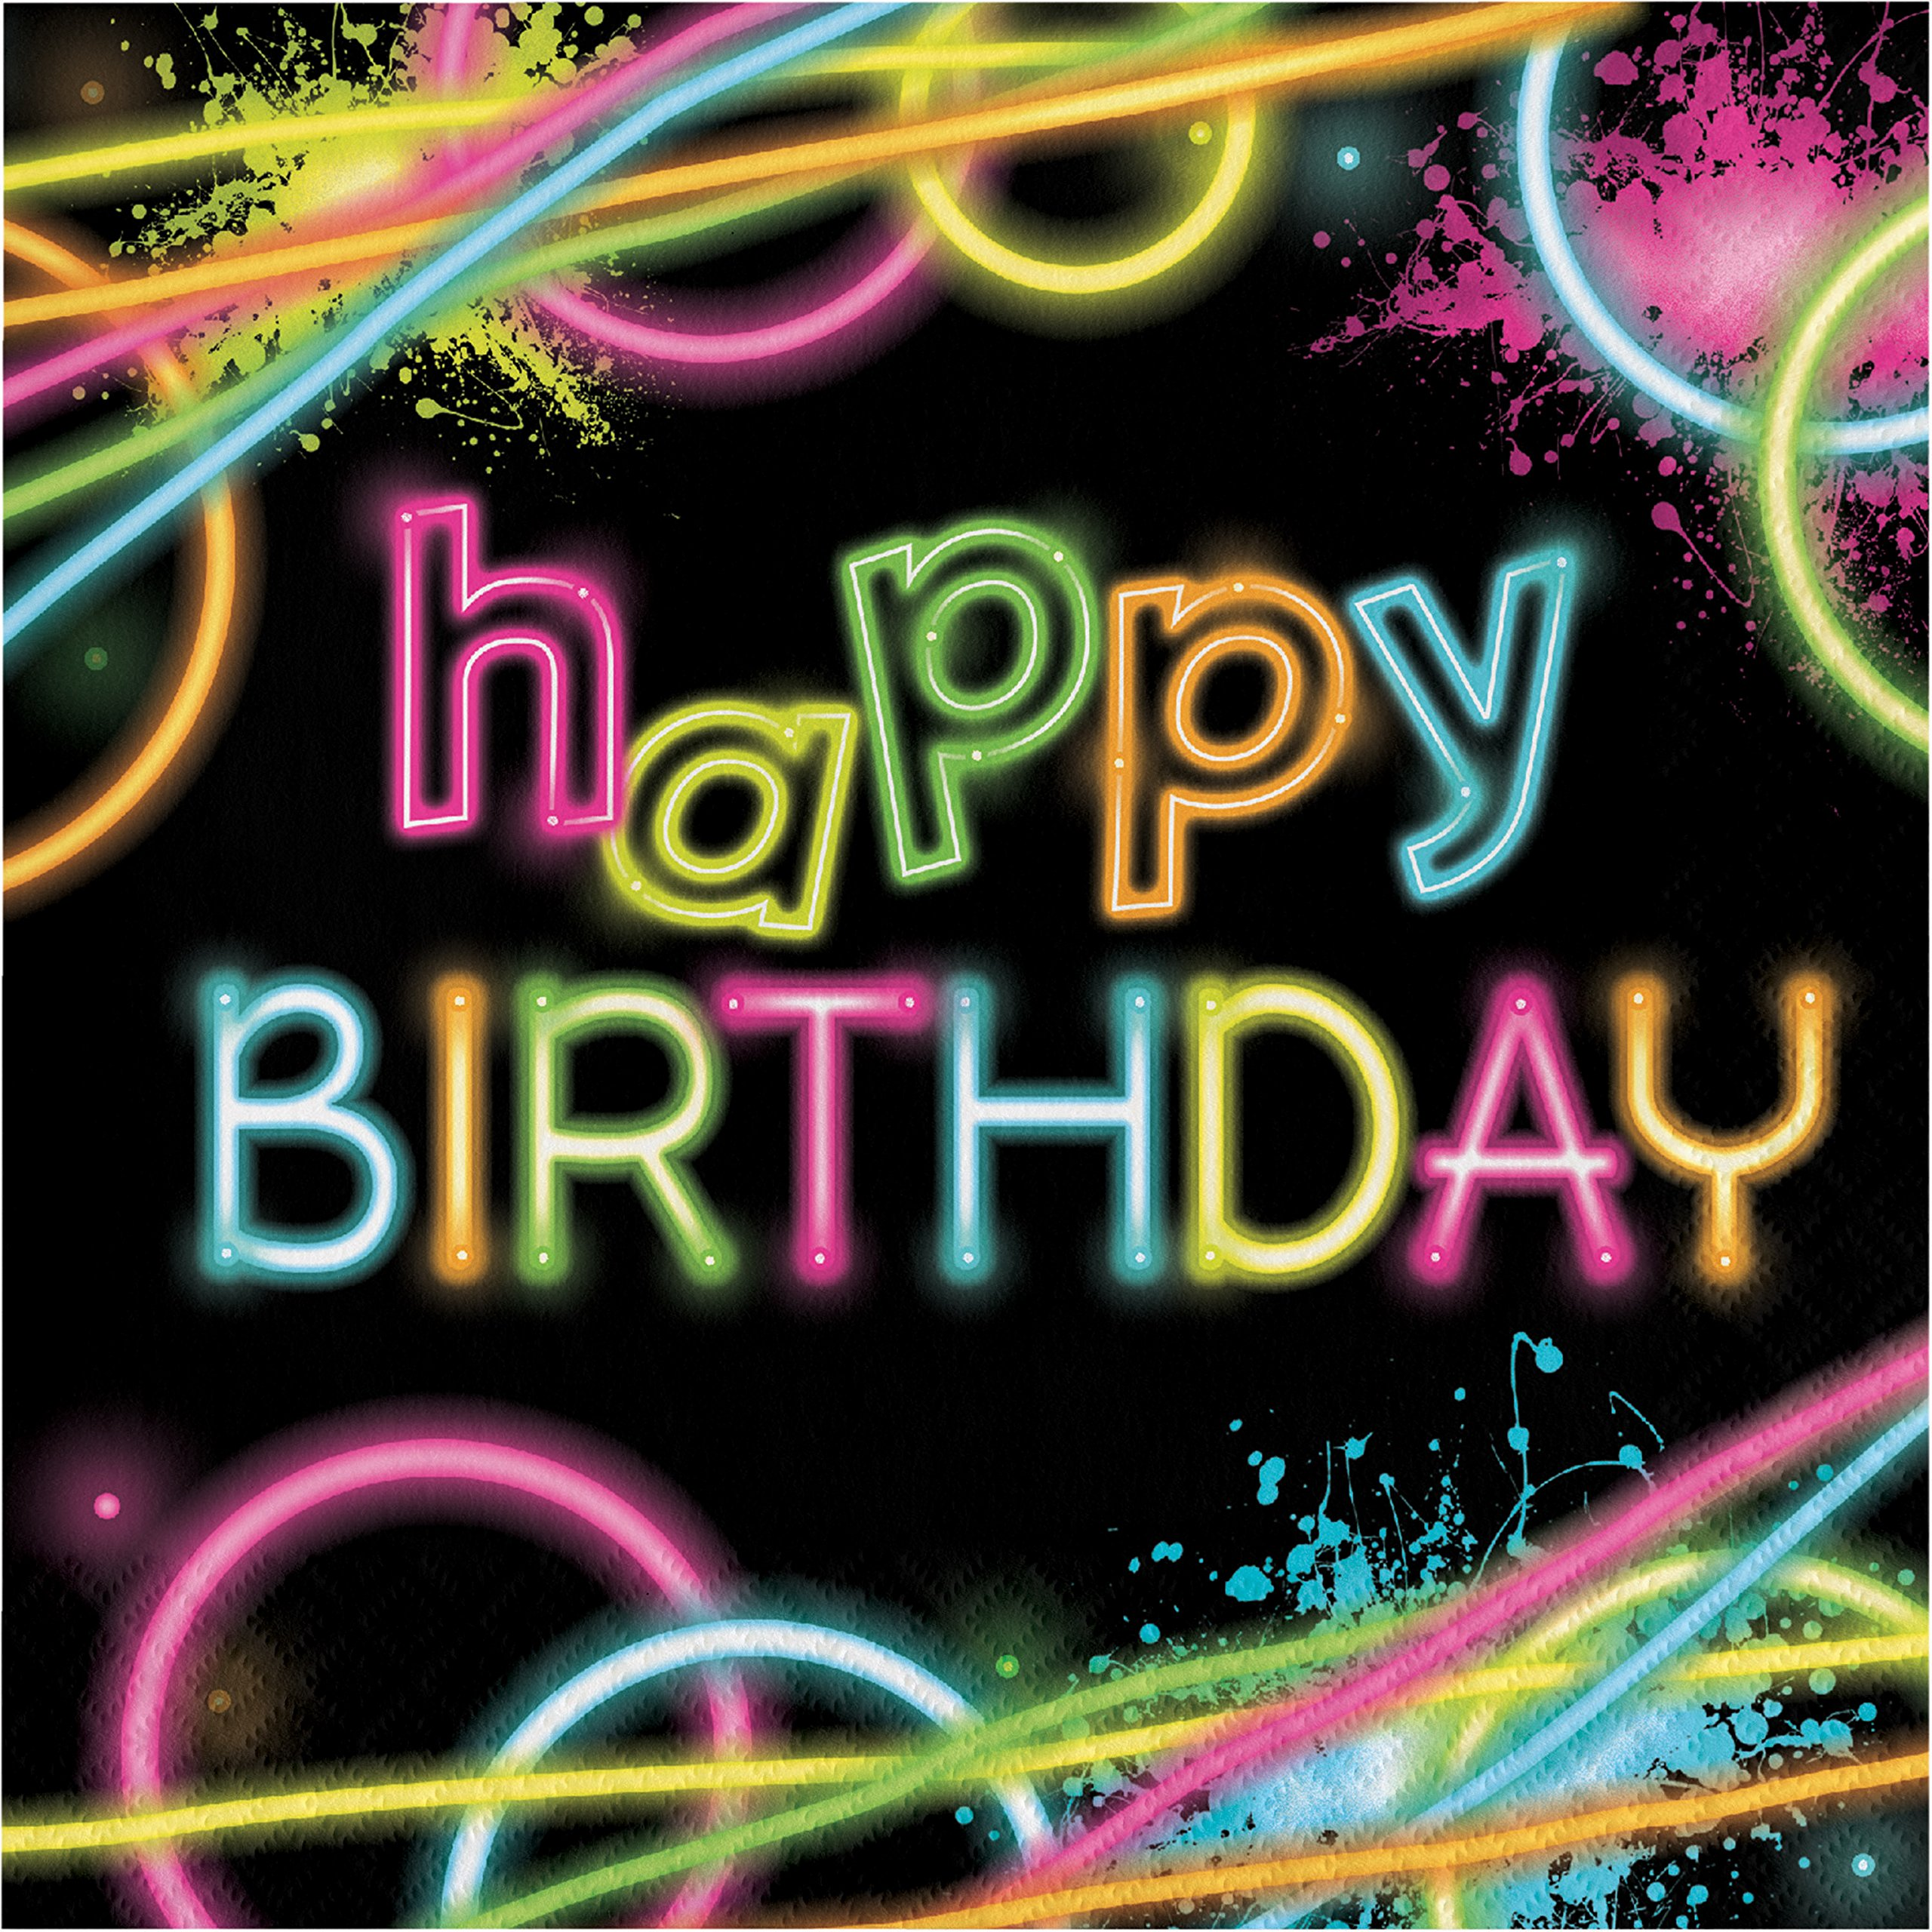 Glow Party Birthday Napkins, 48 Count